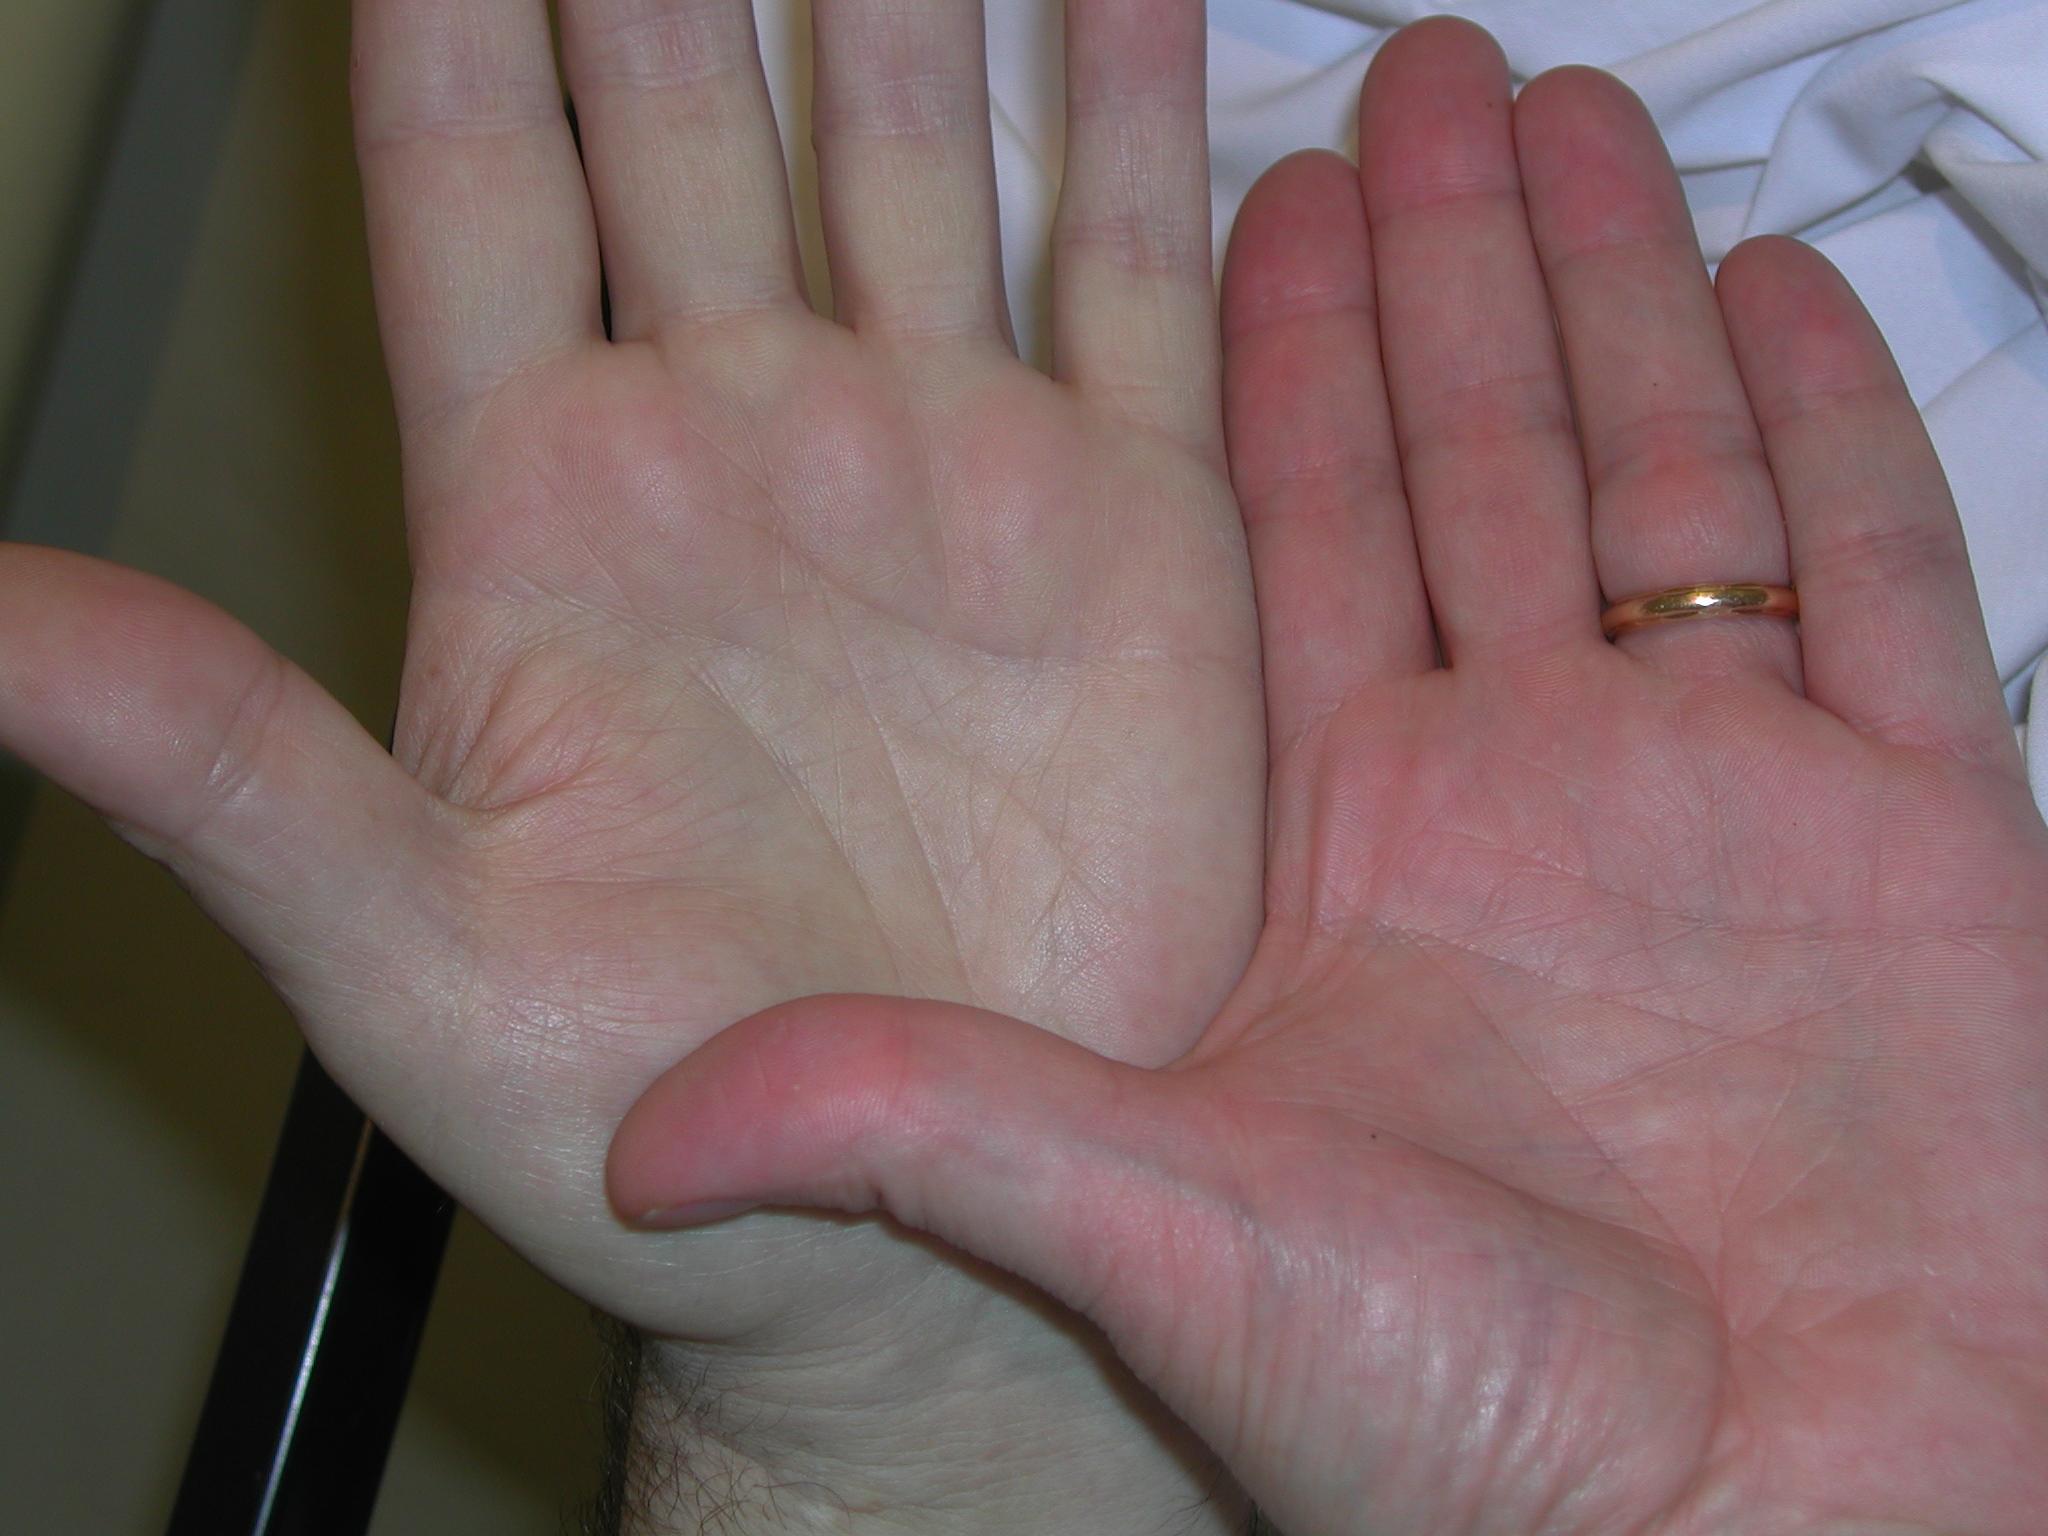 rankos sergant anemija.lt